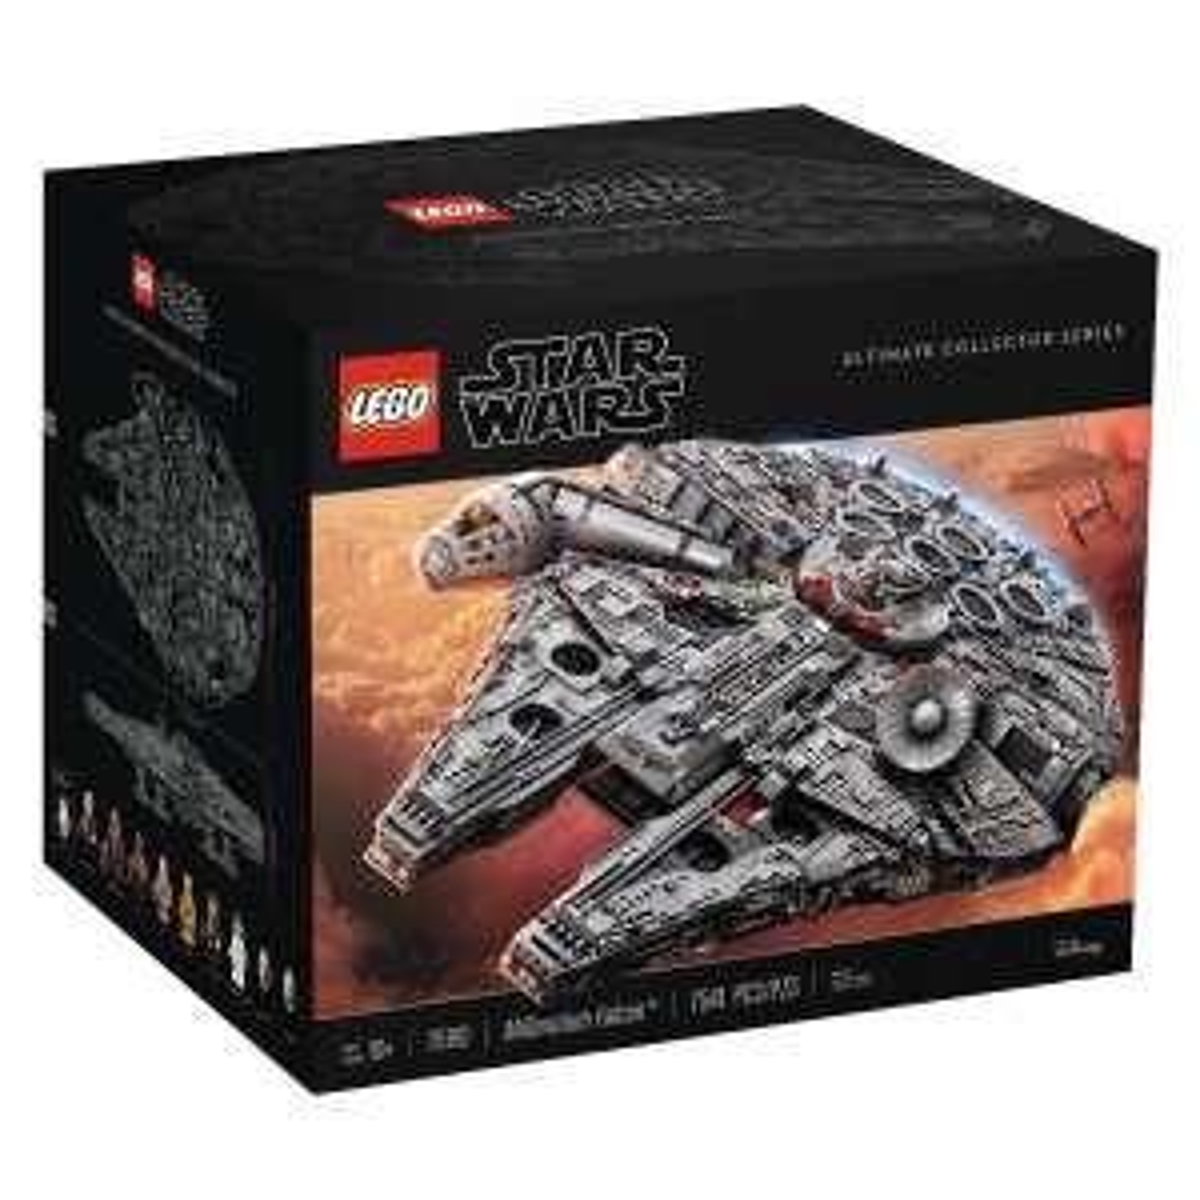 Lego 75192 UCS Millenium Falcon Collector Set £498.40 (€565.20) delivered @ El Corte Ingles